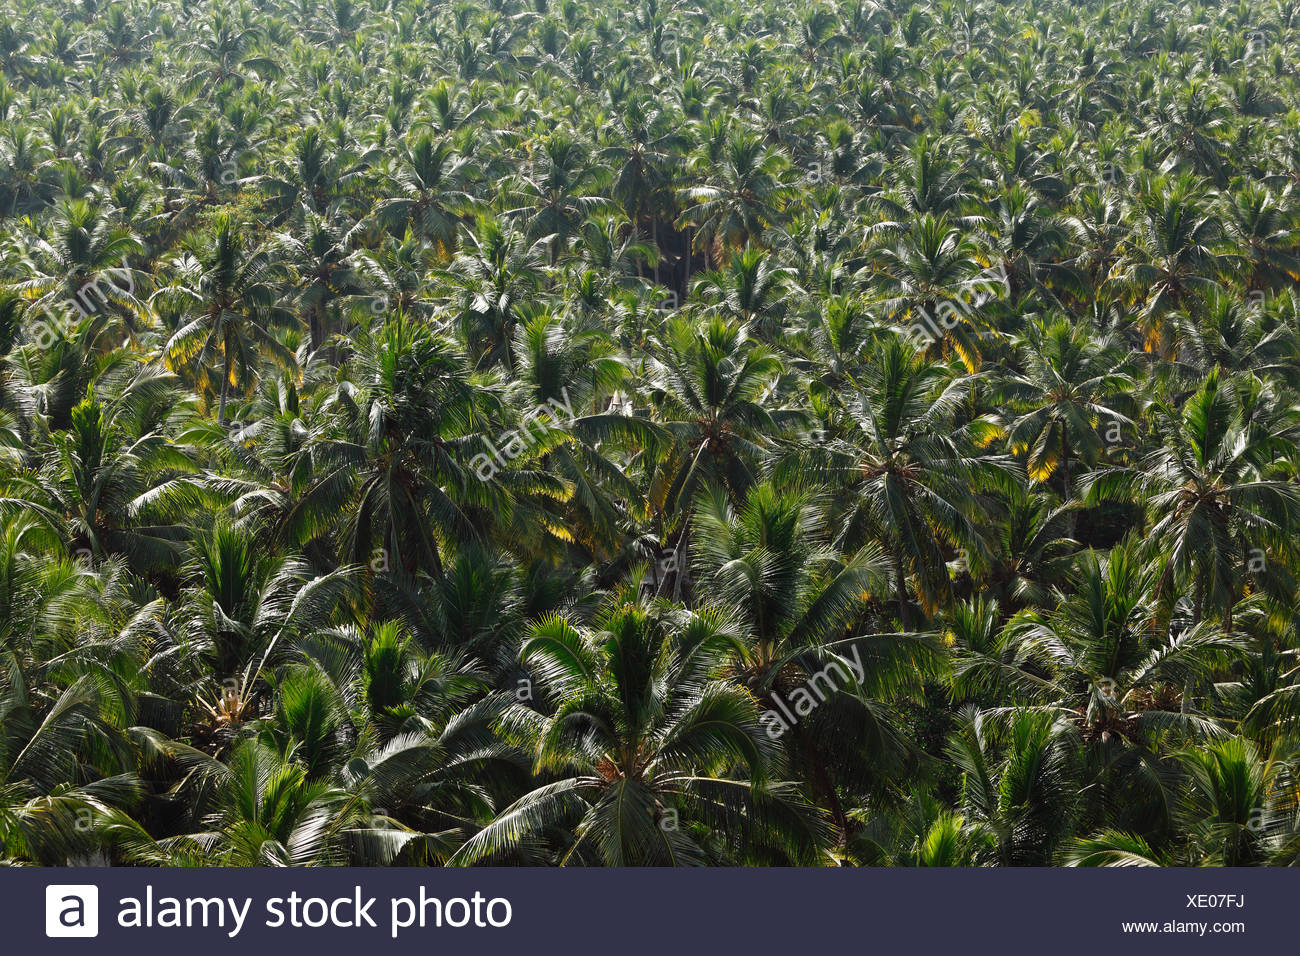 Forest of coconut palms, Malabarian Coast, Malabar, Kerala, India, Asia - Stock Image